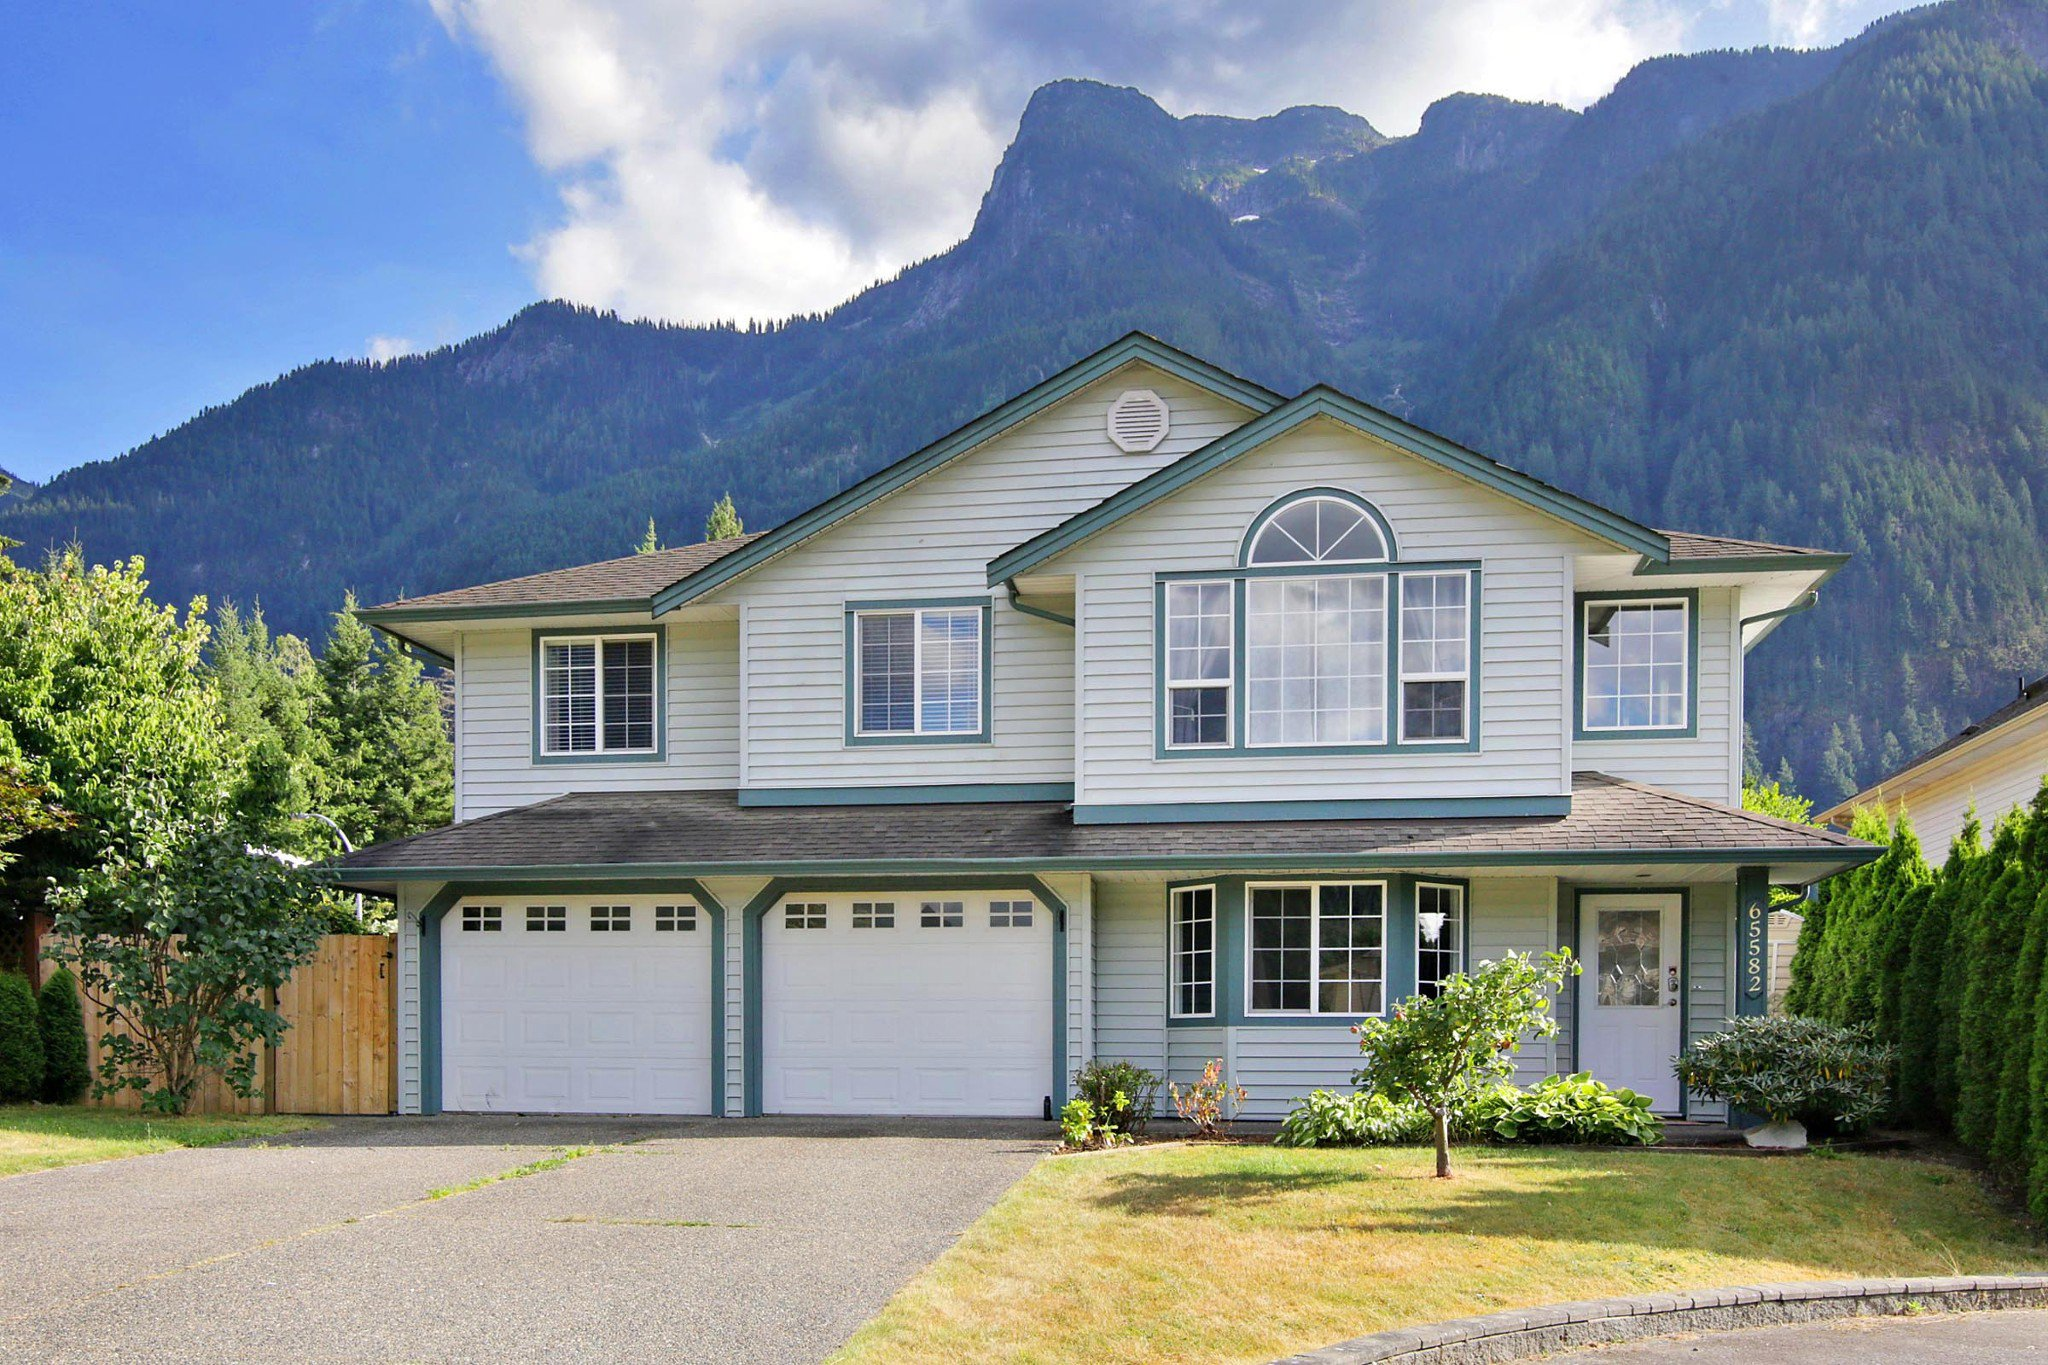 Main Photo: 65582 MOUNTAIN ASH Drive in Hope: Hope Kawkawa Lake House for sale : MLS®# R2485539